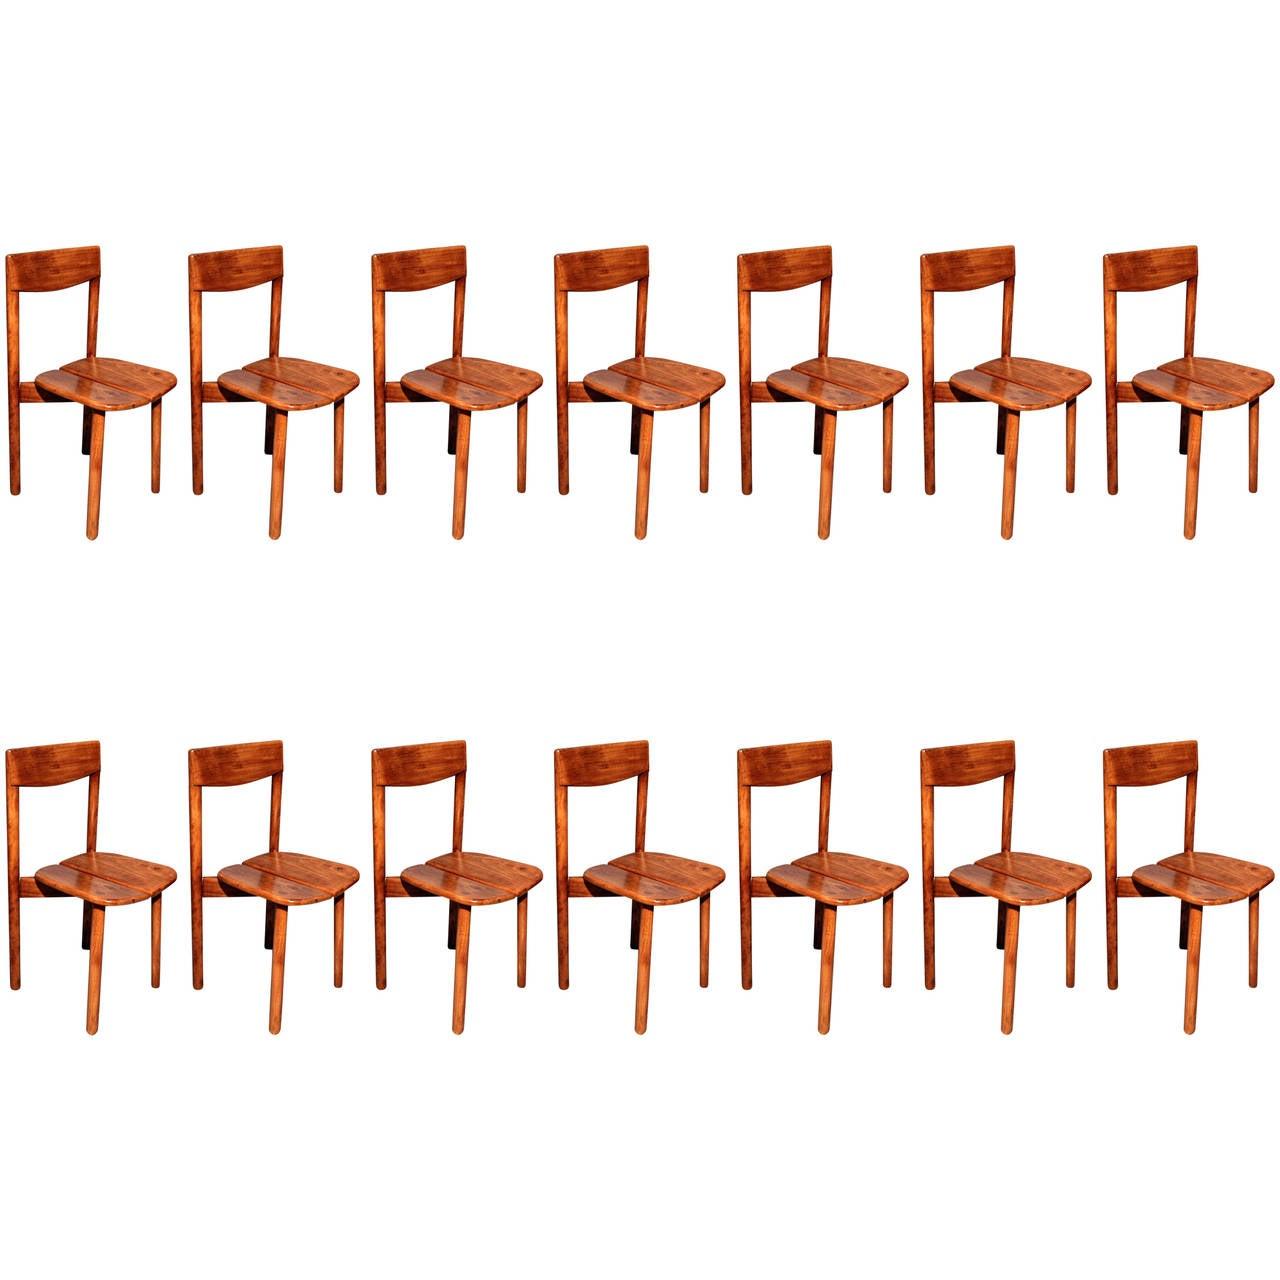 Pierre Gautier Delaye, set of fourteen chairs, France circa 1960